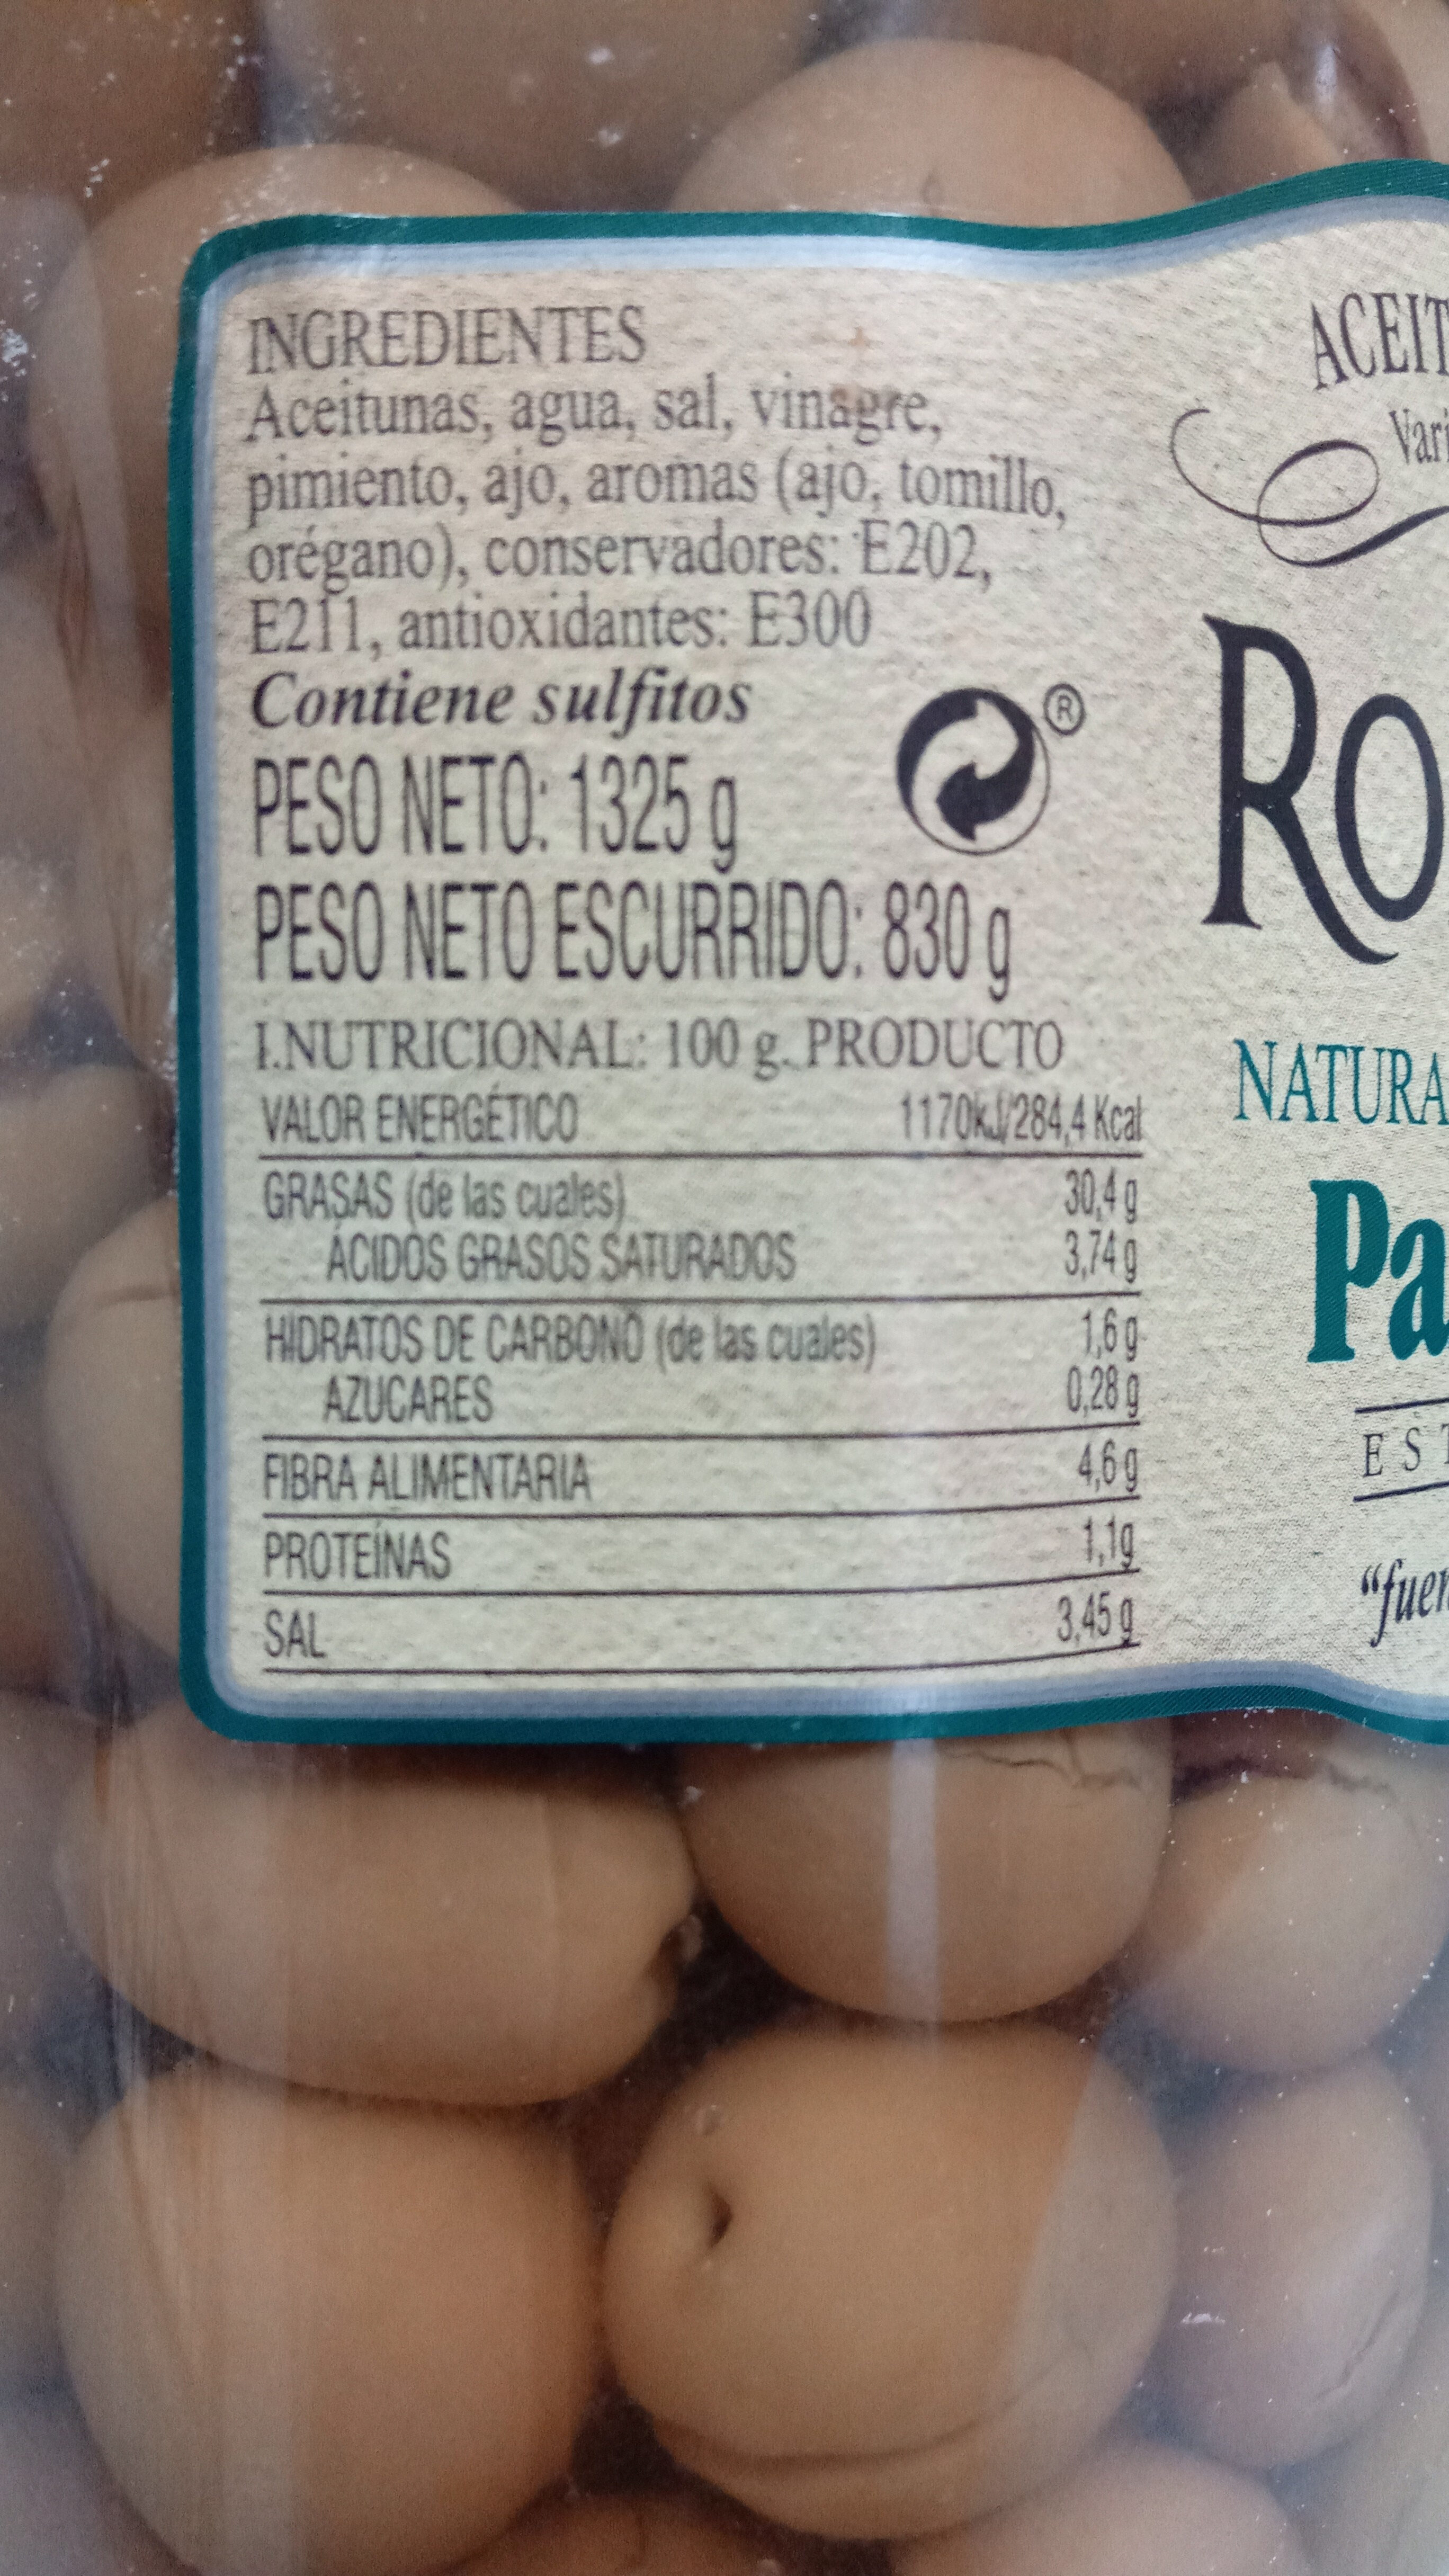 Aceituna verde natural malagueña partida - Informació nutricional - es